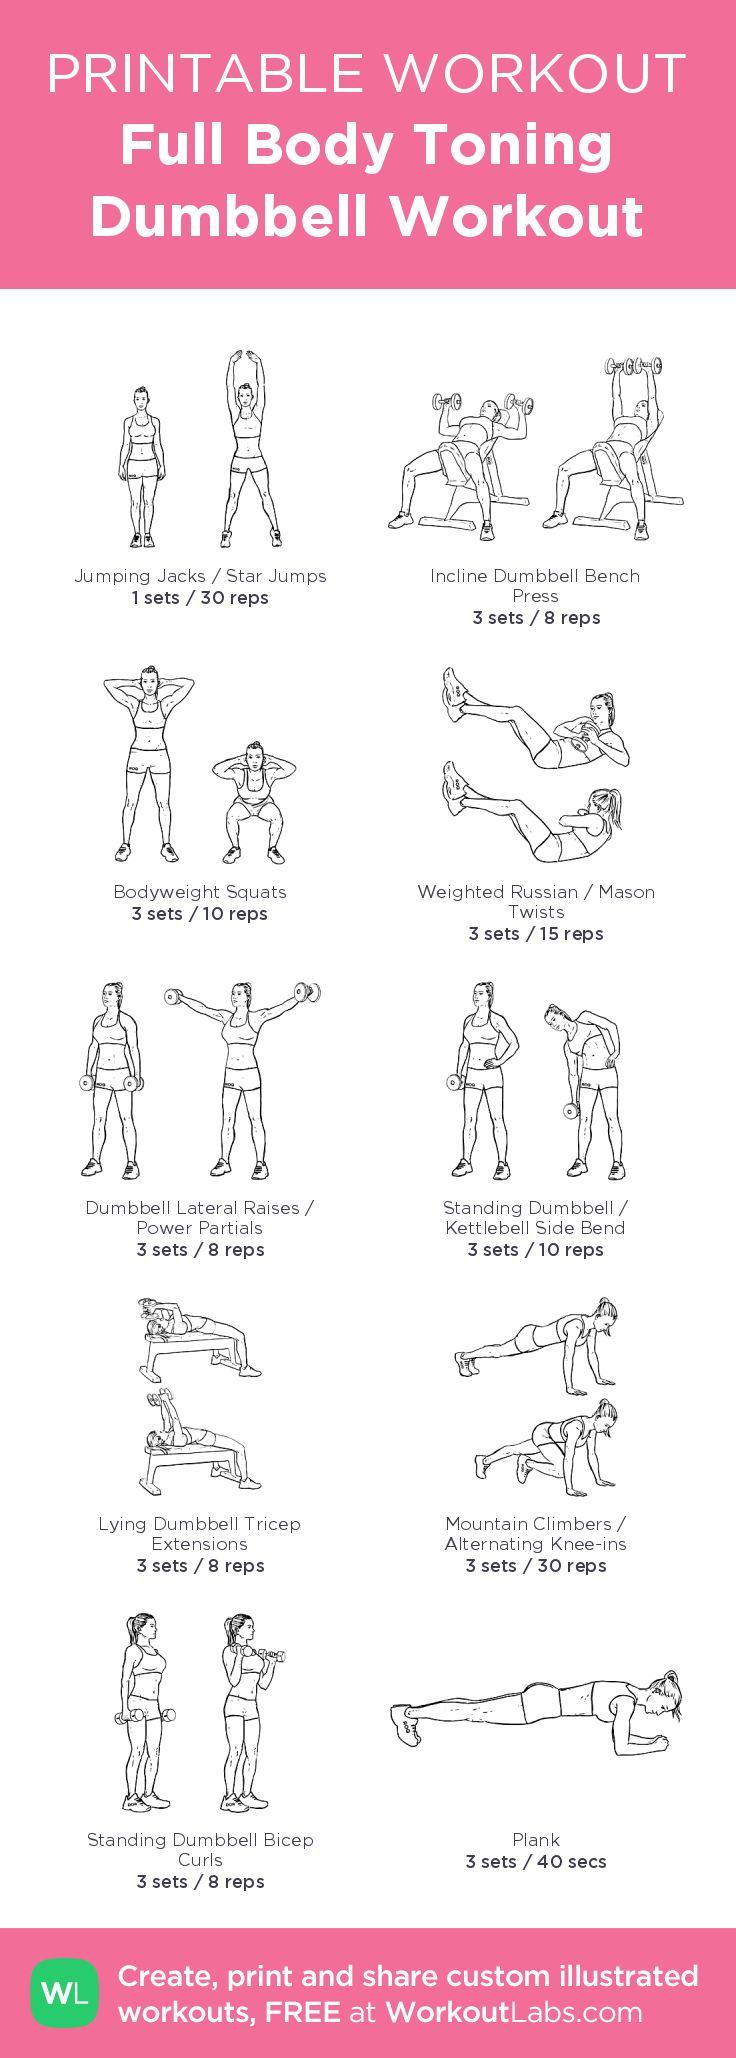 By Photo Congress || Summer Body Workout Plan Female Pdf